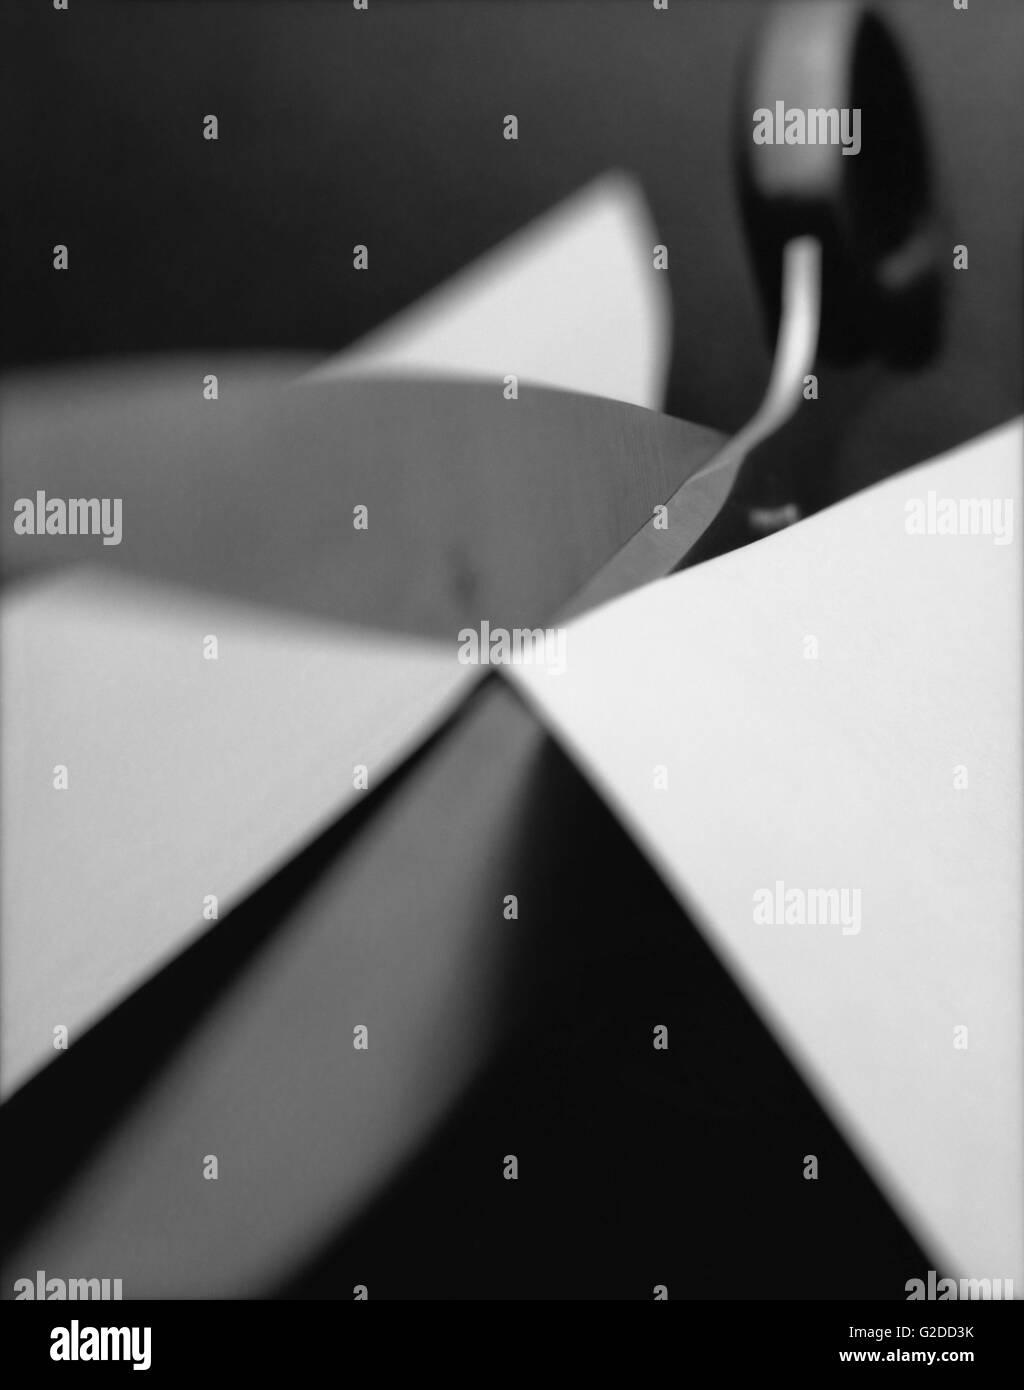 Scissors and Paper - Stock Image